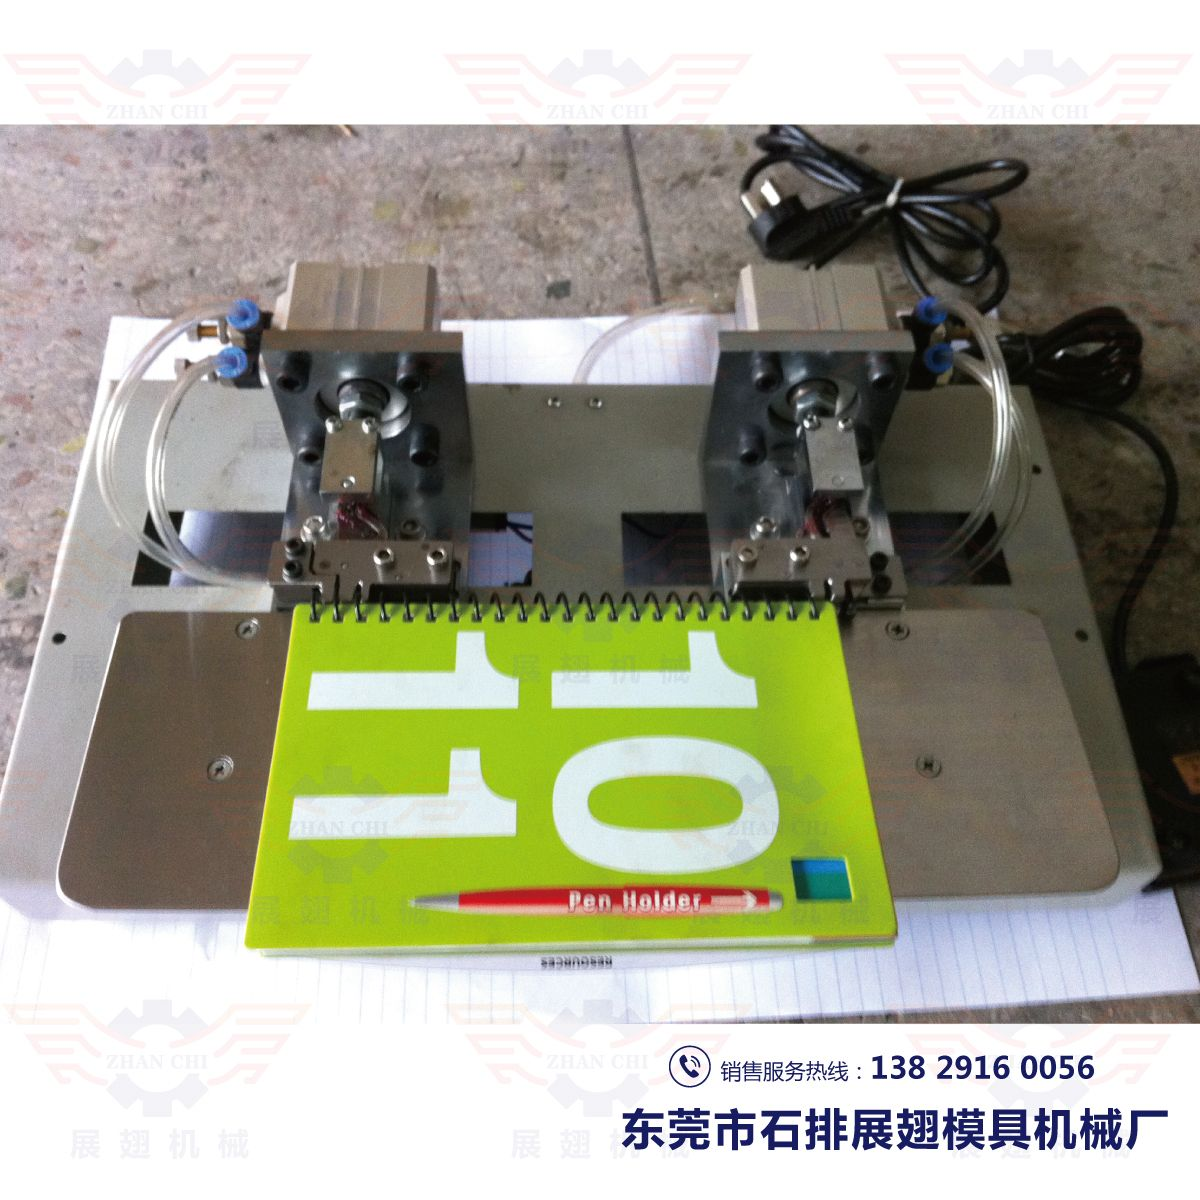 ZC-W100 单线圈弯头机